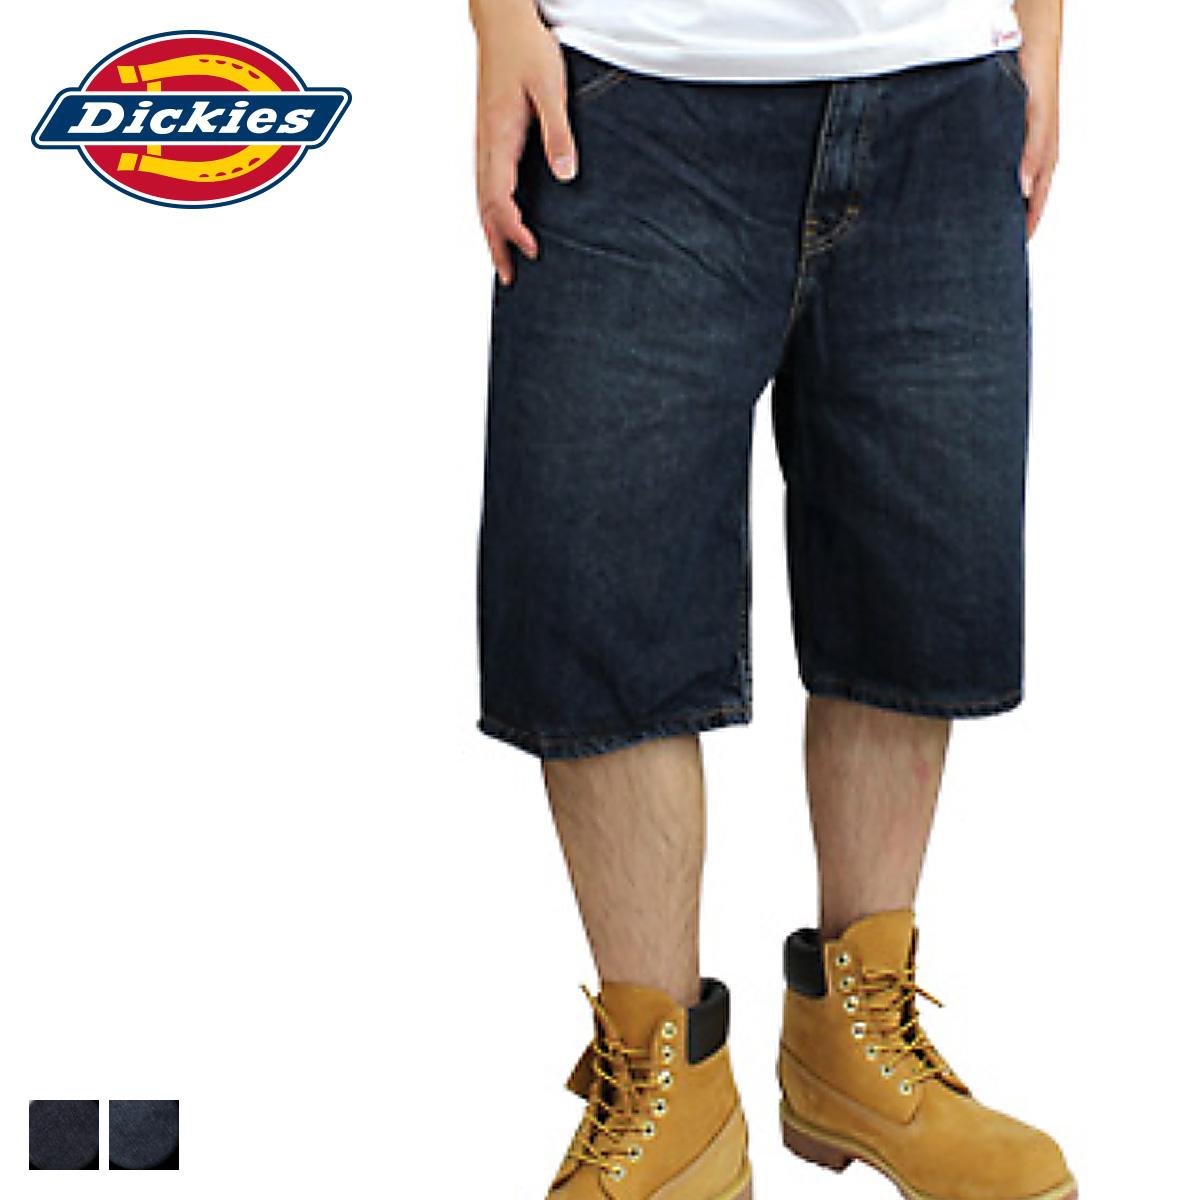 Dickies Dickies DR211 denim shorts shorts men's Dickies 11 inch work shorts indigo blue relaxed fit [genuine]